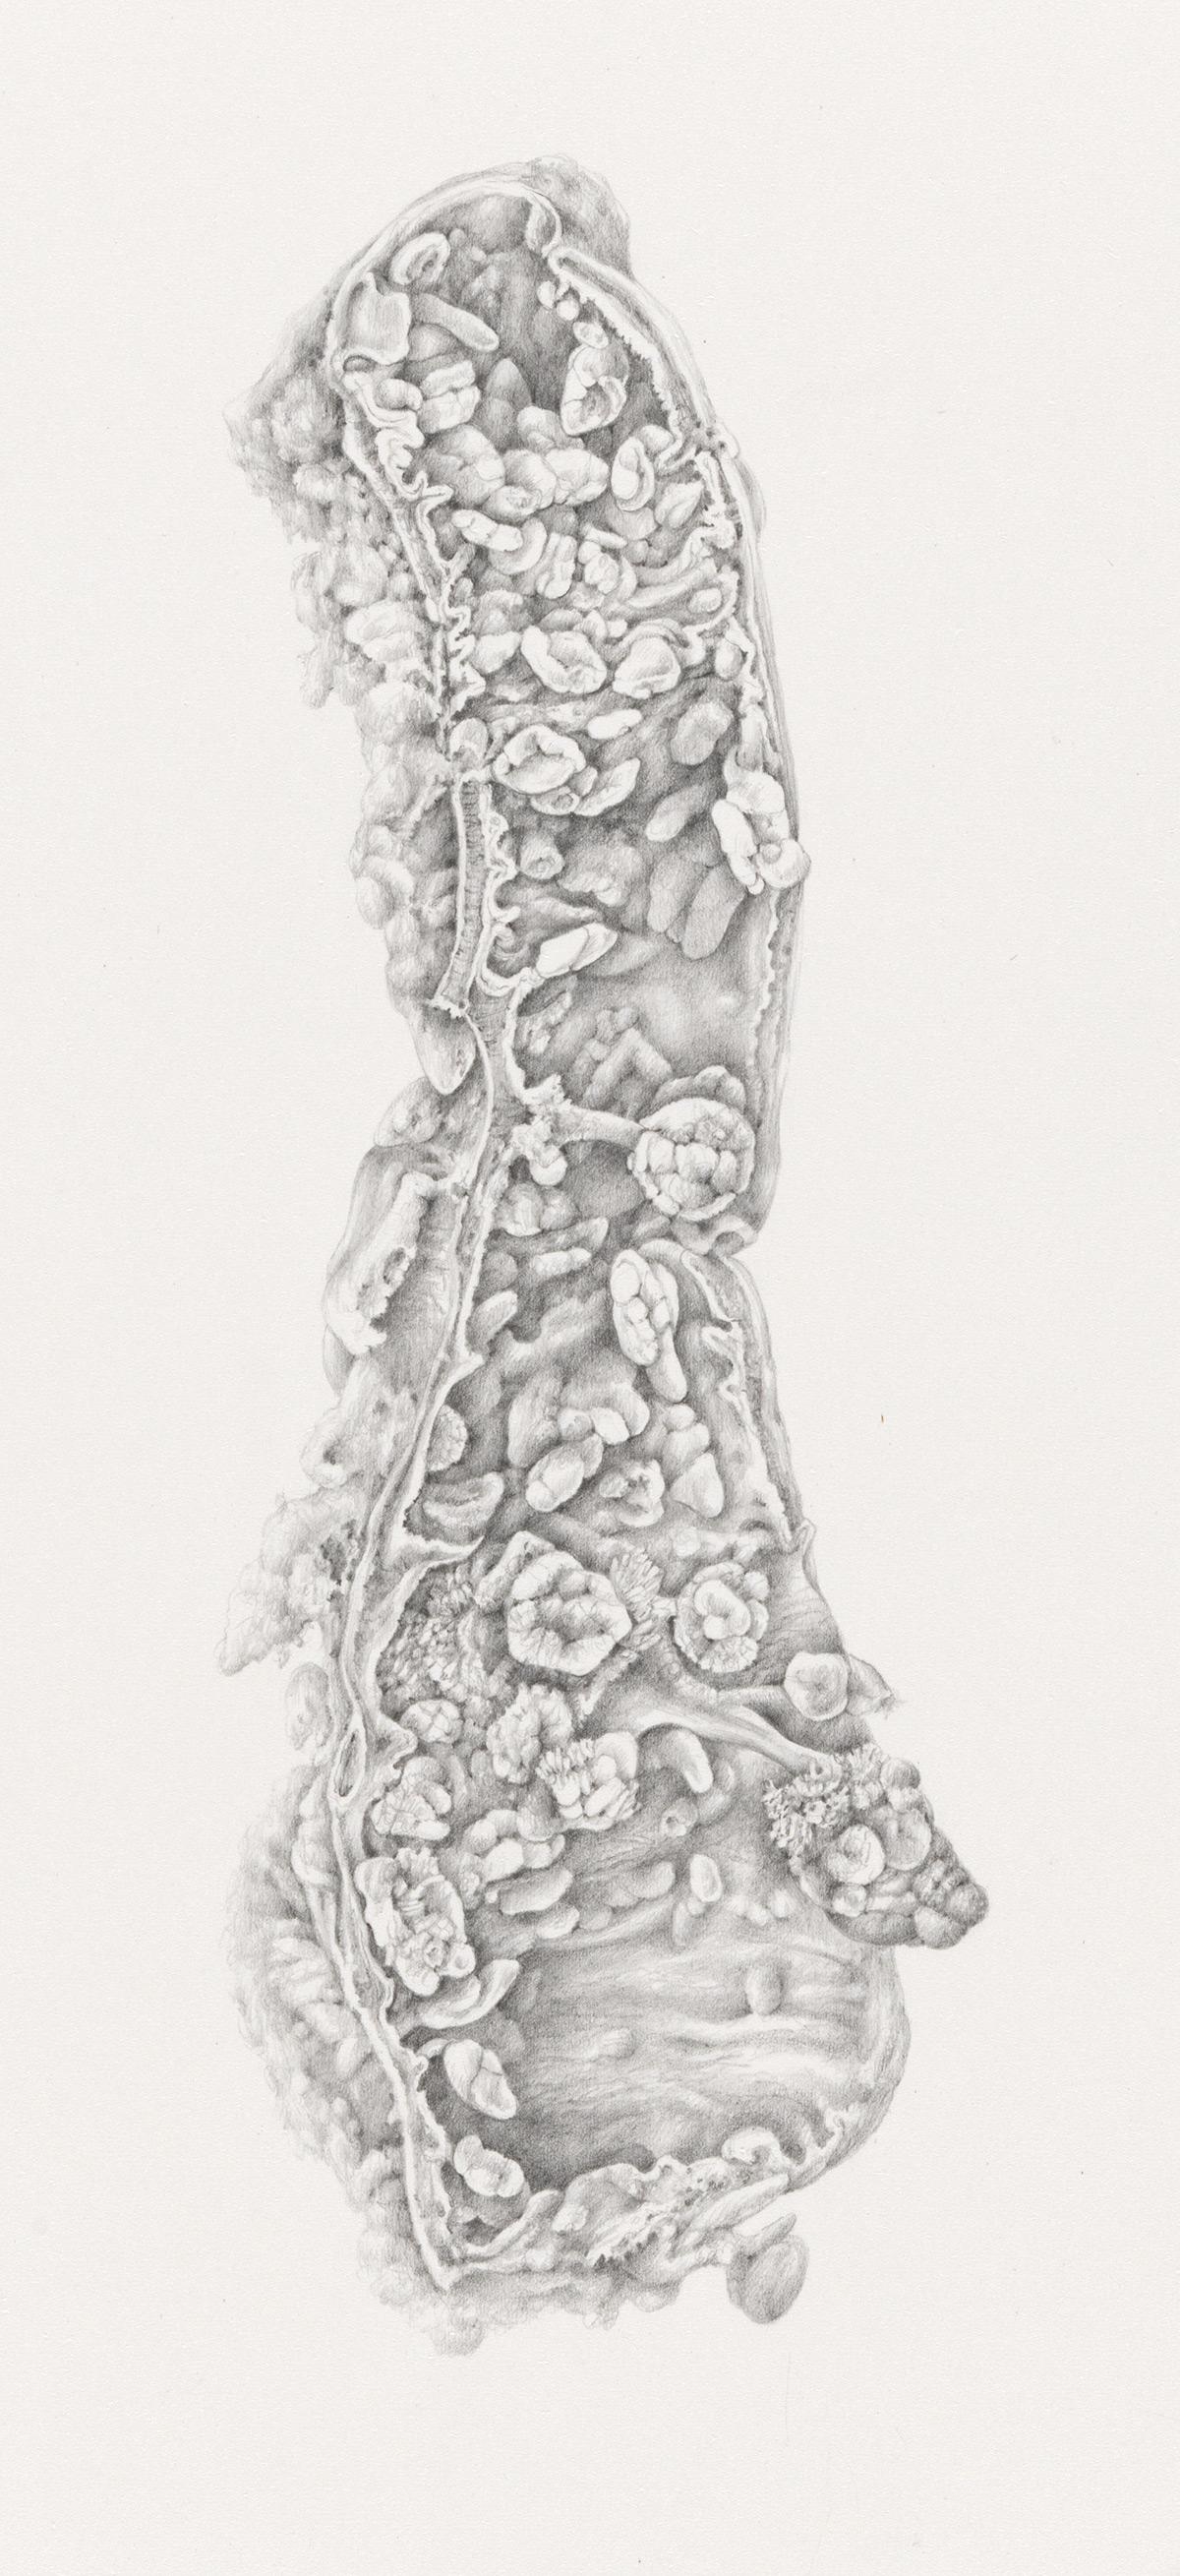 drawing05.jpg